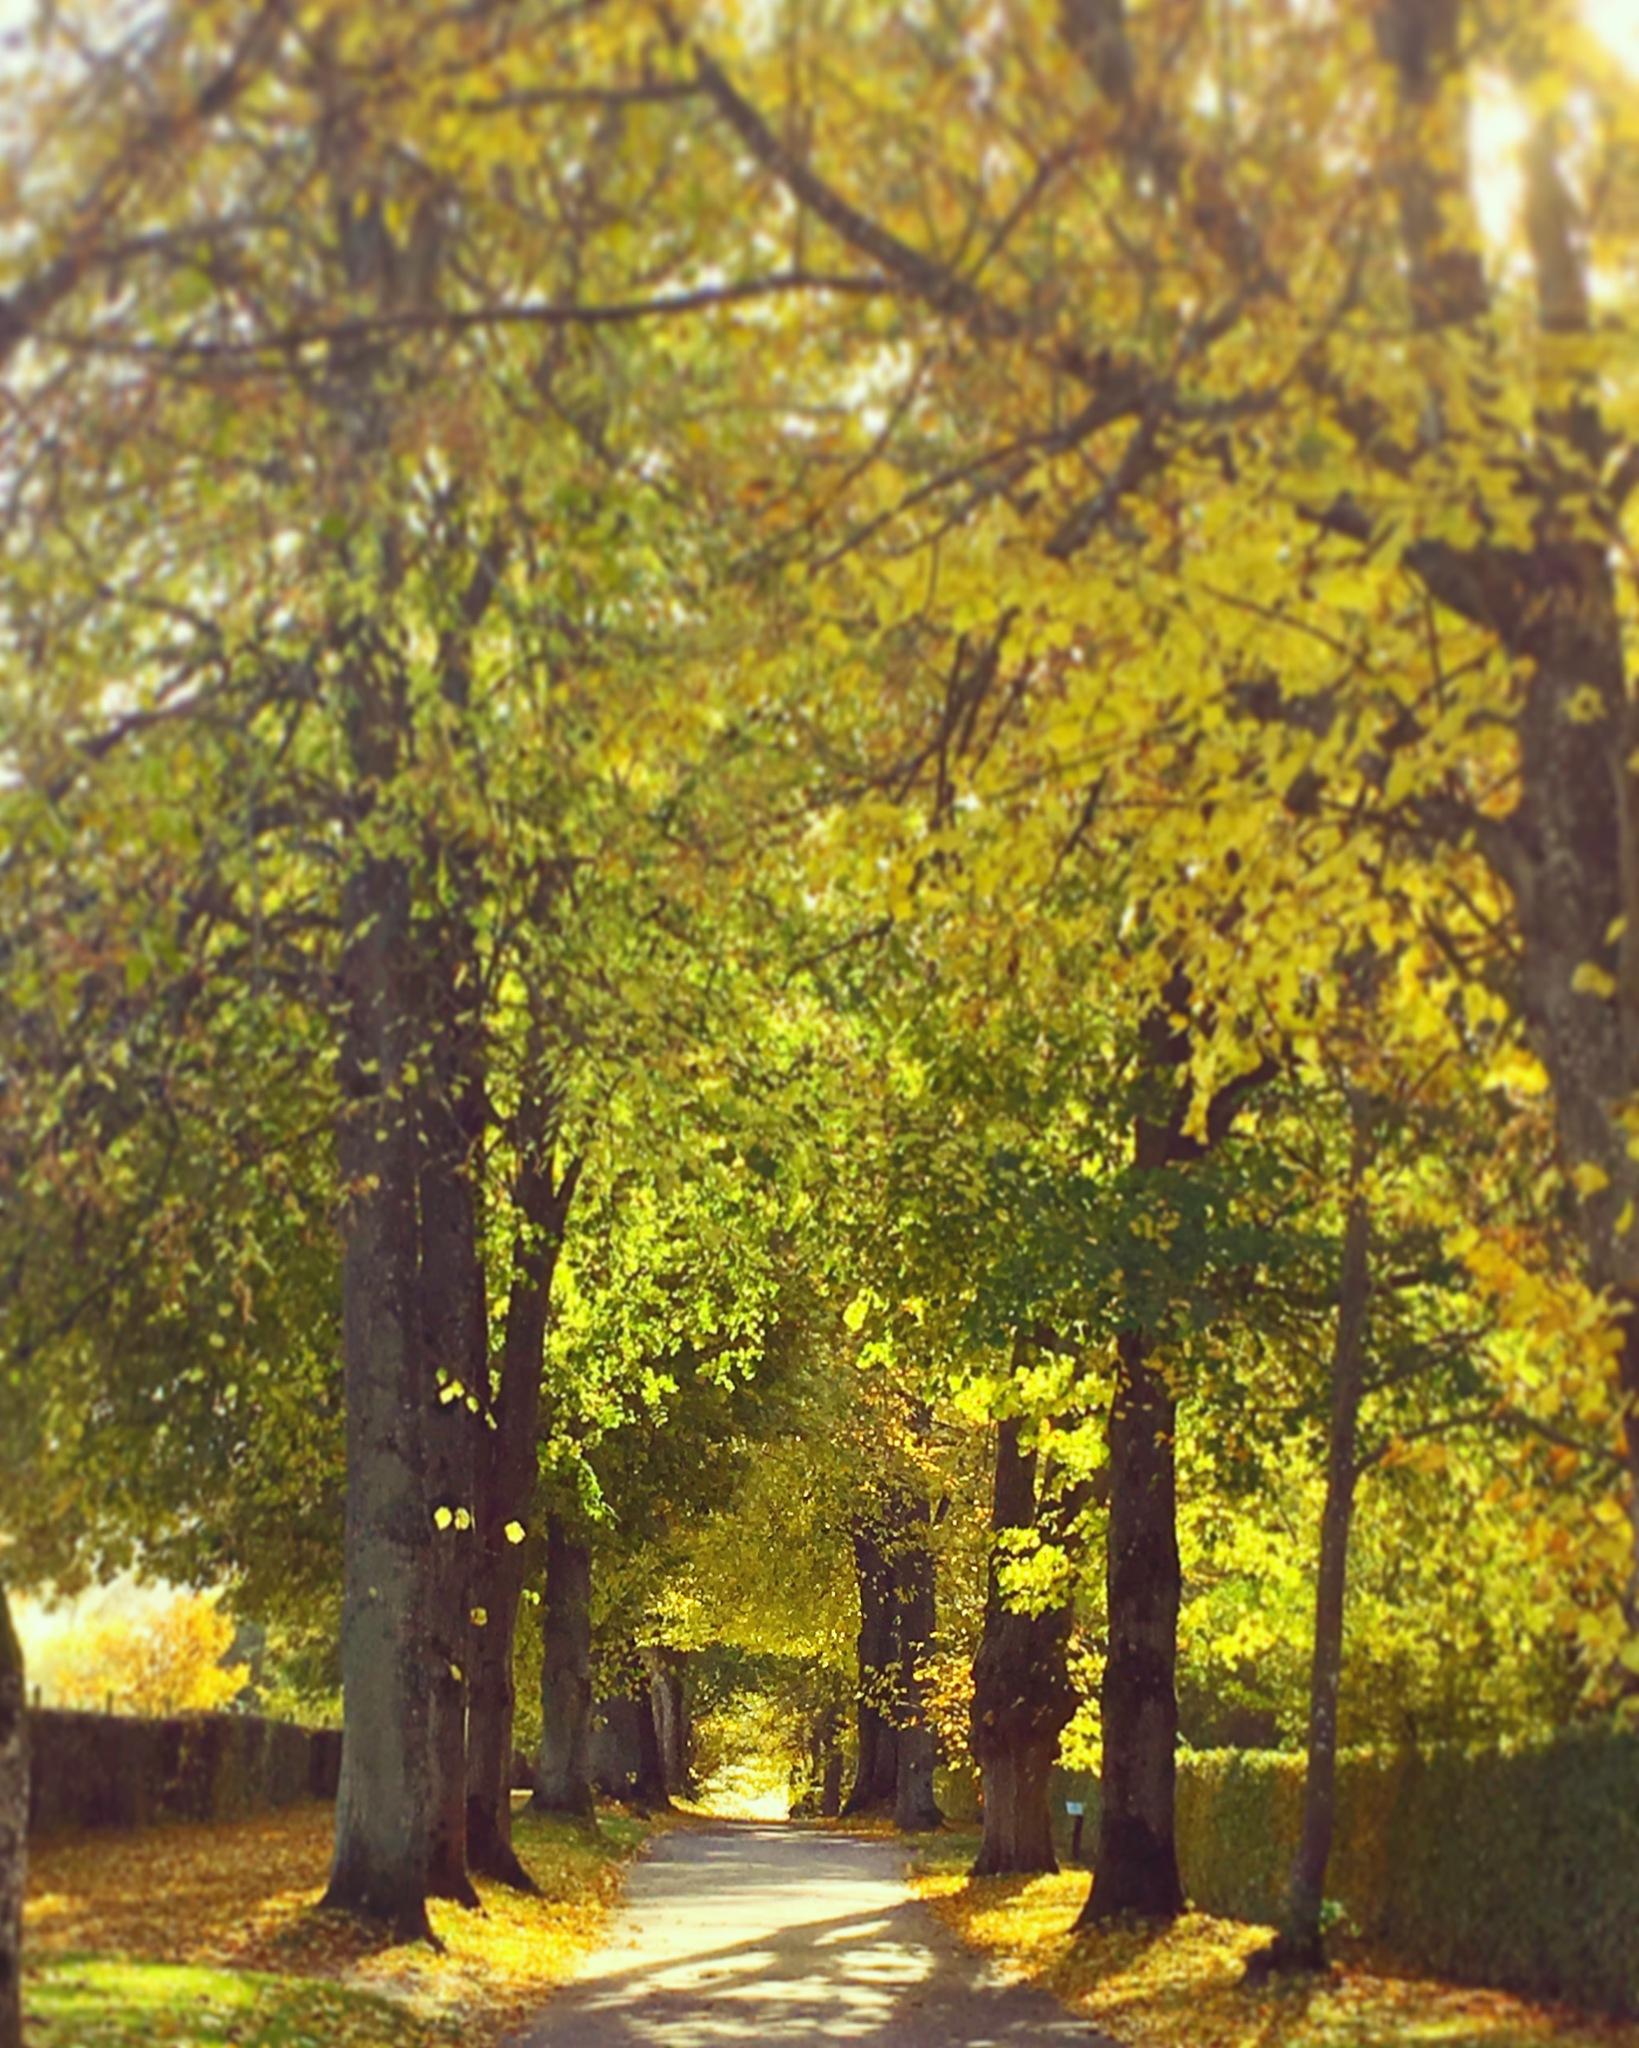 collors of autumn  by zinajda.besic